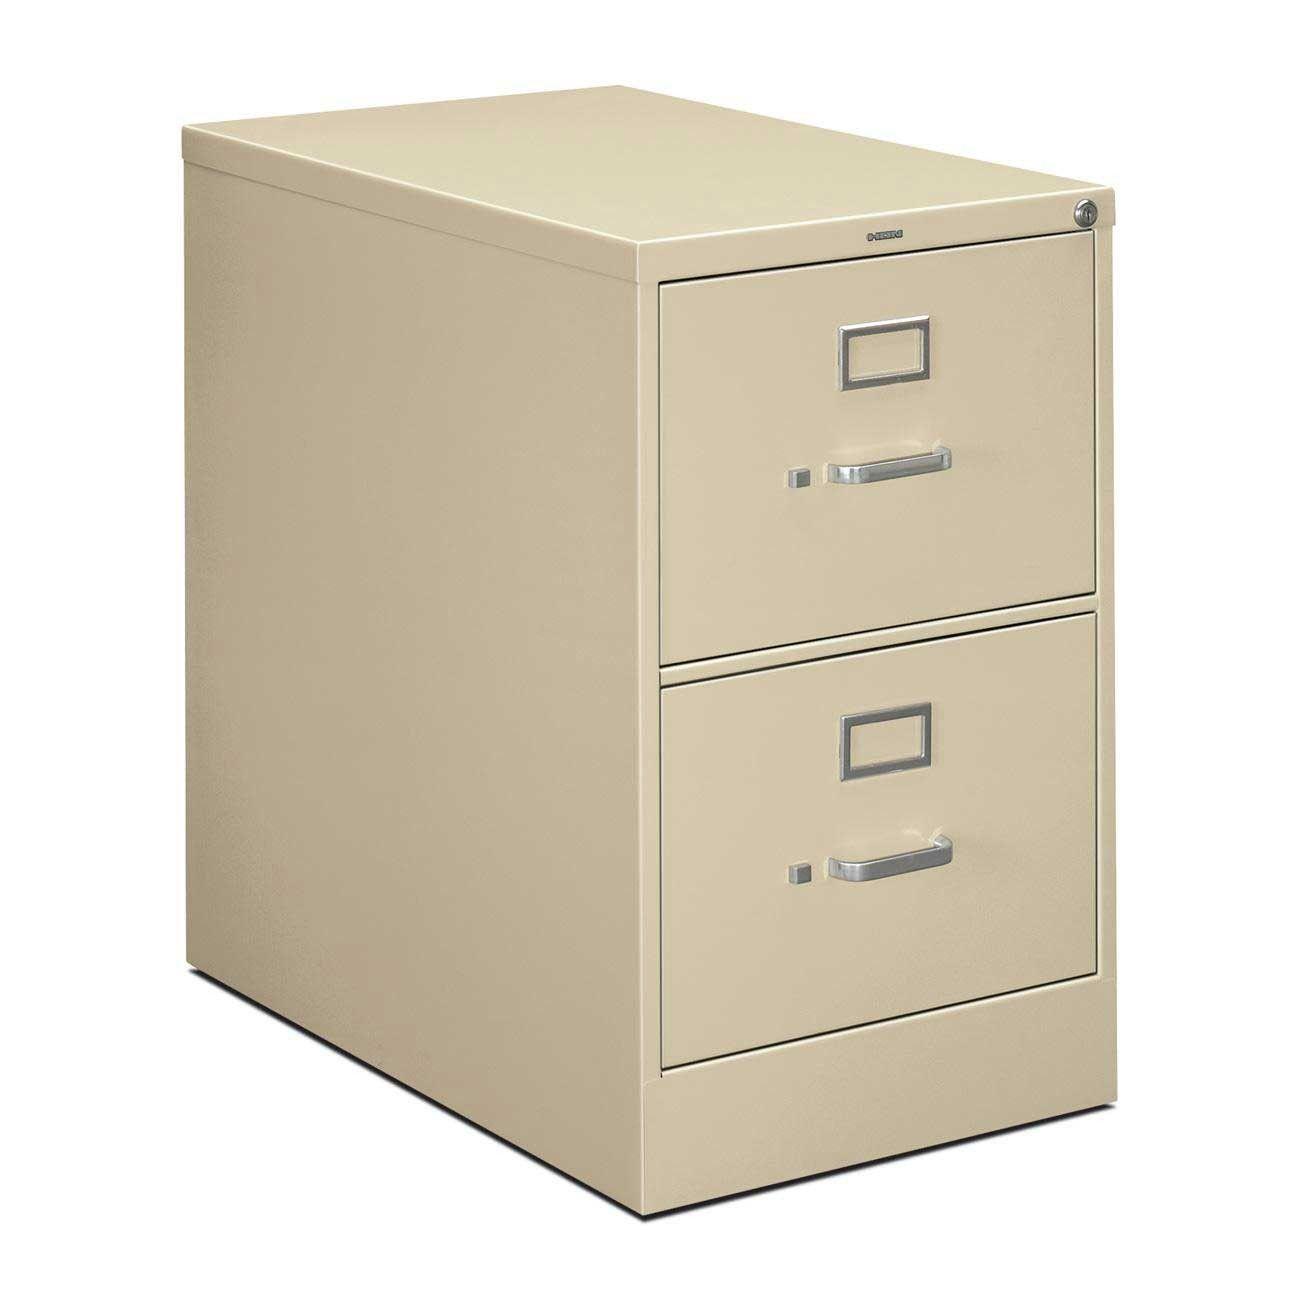 20 File Folder Racks For Cabinets Kitchen Shelf Display Ideas Check More At Http Www Planetgreenspot 77 Ca